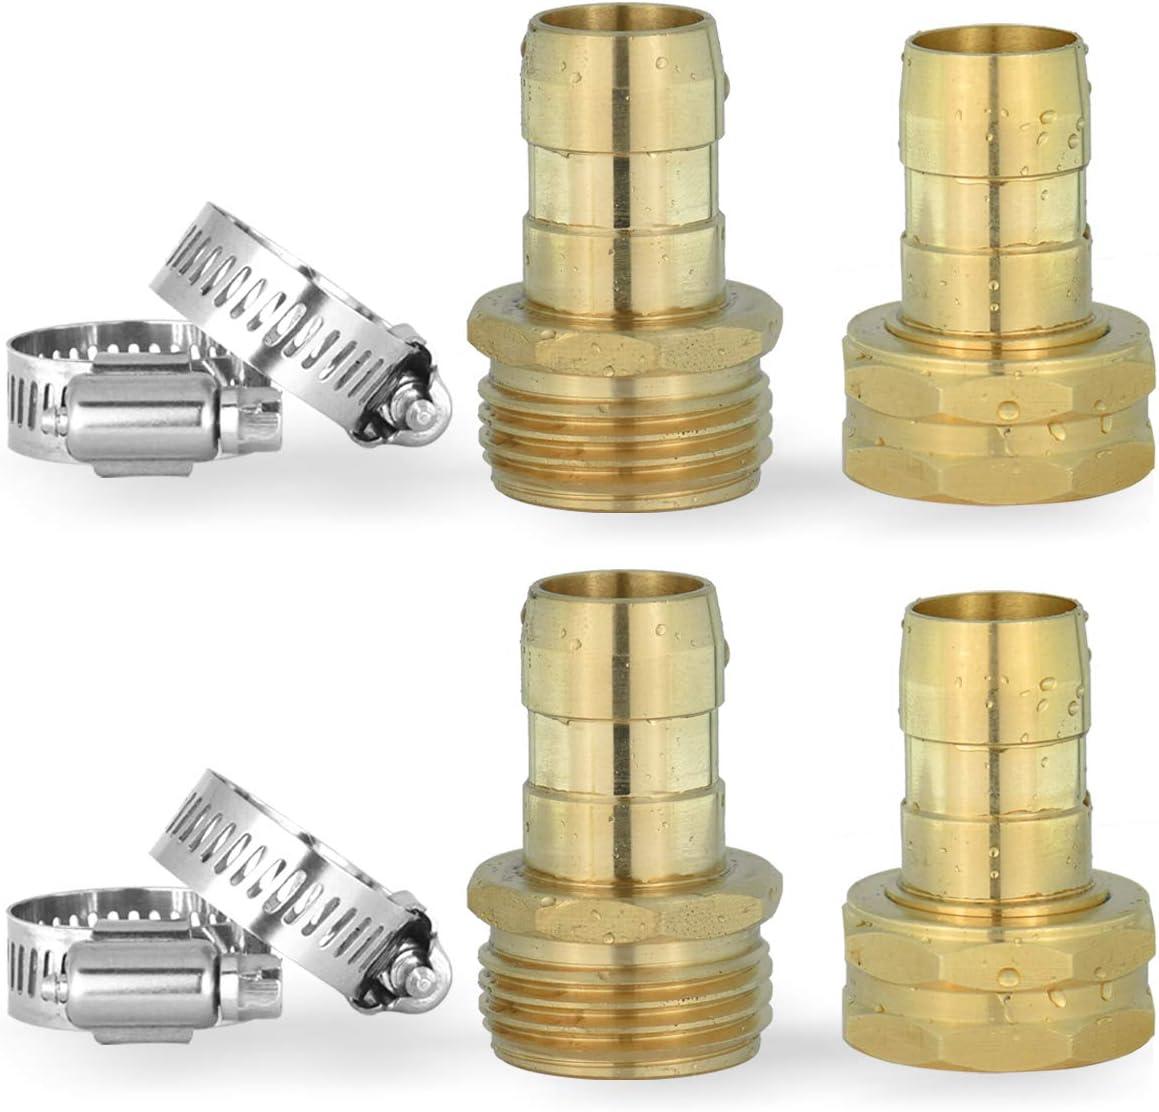 "PLG 5/8"" Solid Brass Garden Hose Repair Kit,Hose End Connector/Mender,2 Male+2 Female"